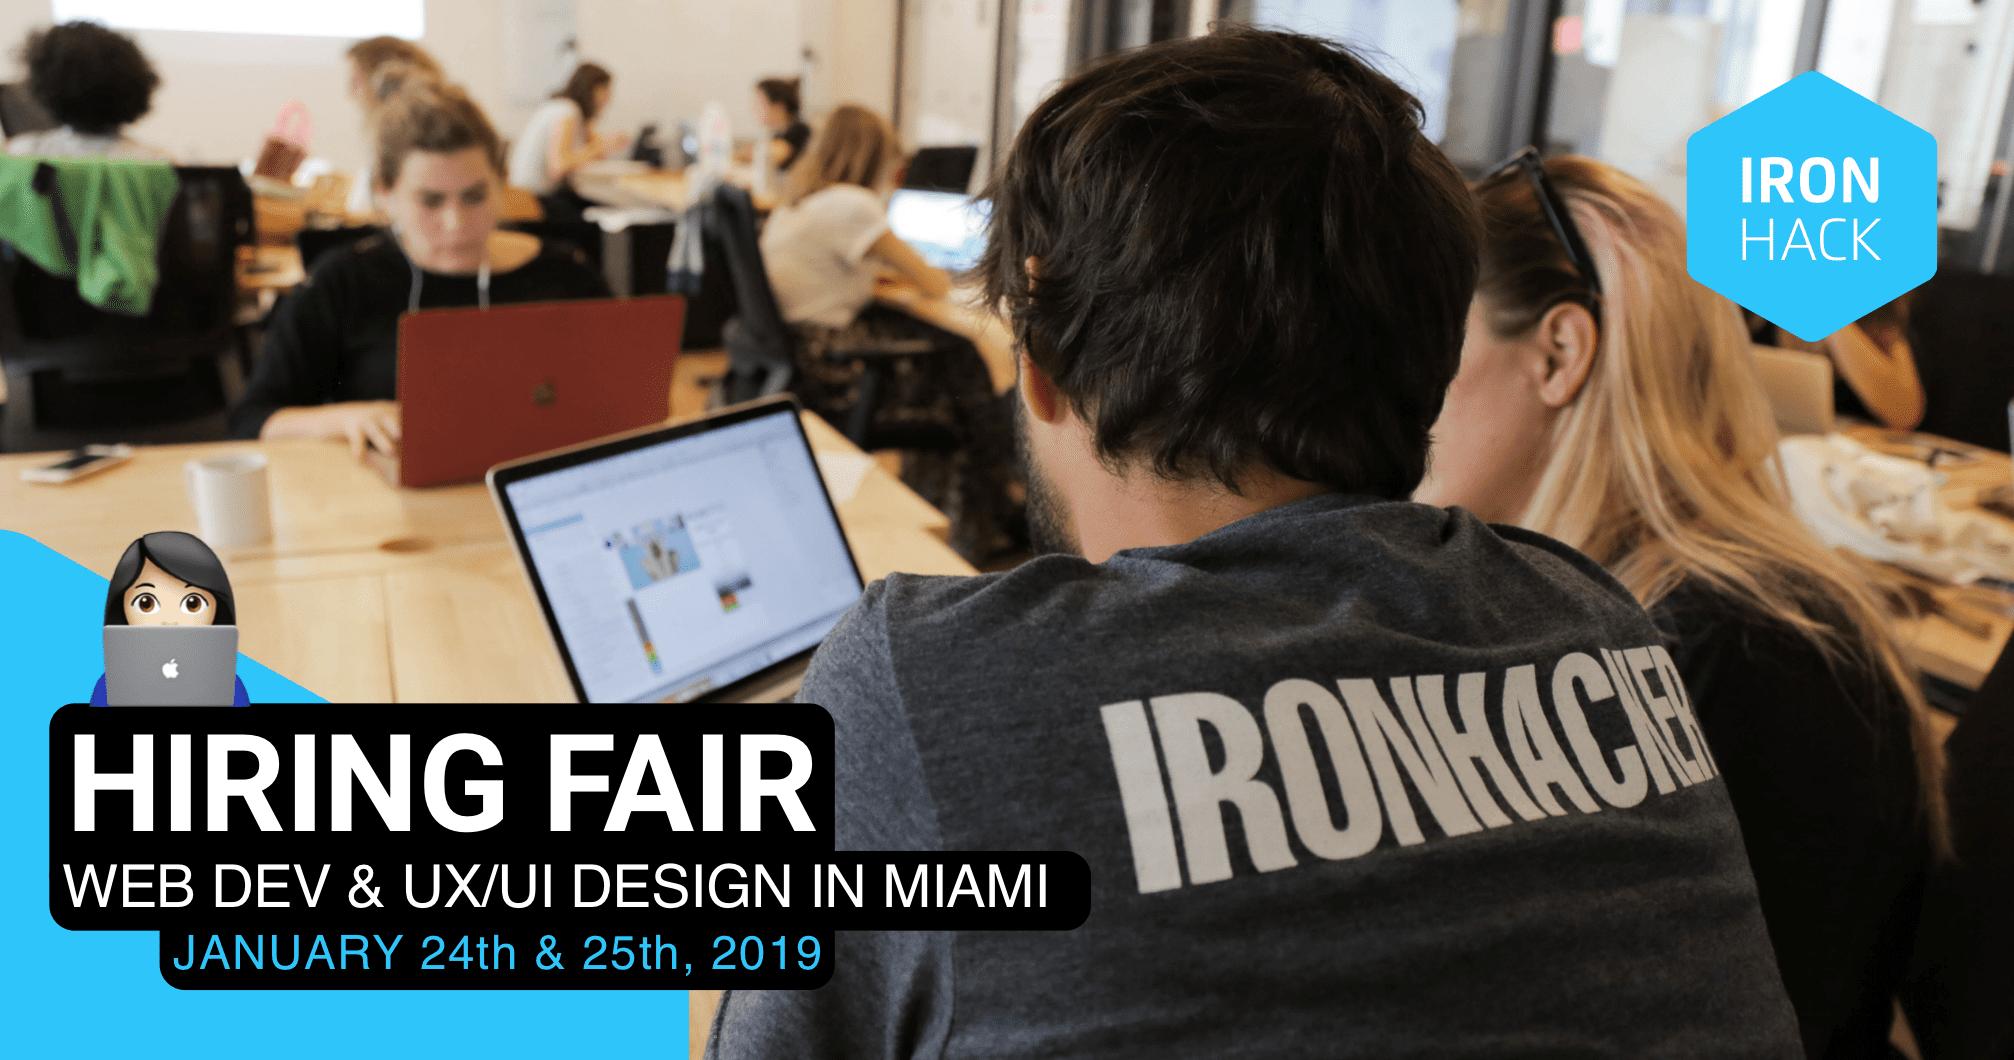 Ironhack Miami Hiring Fair - RSVP Required - Refresh Miami